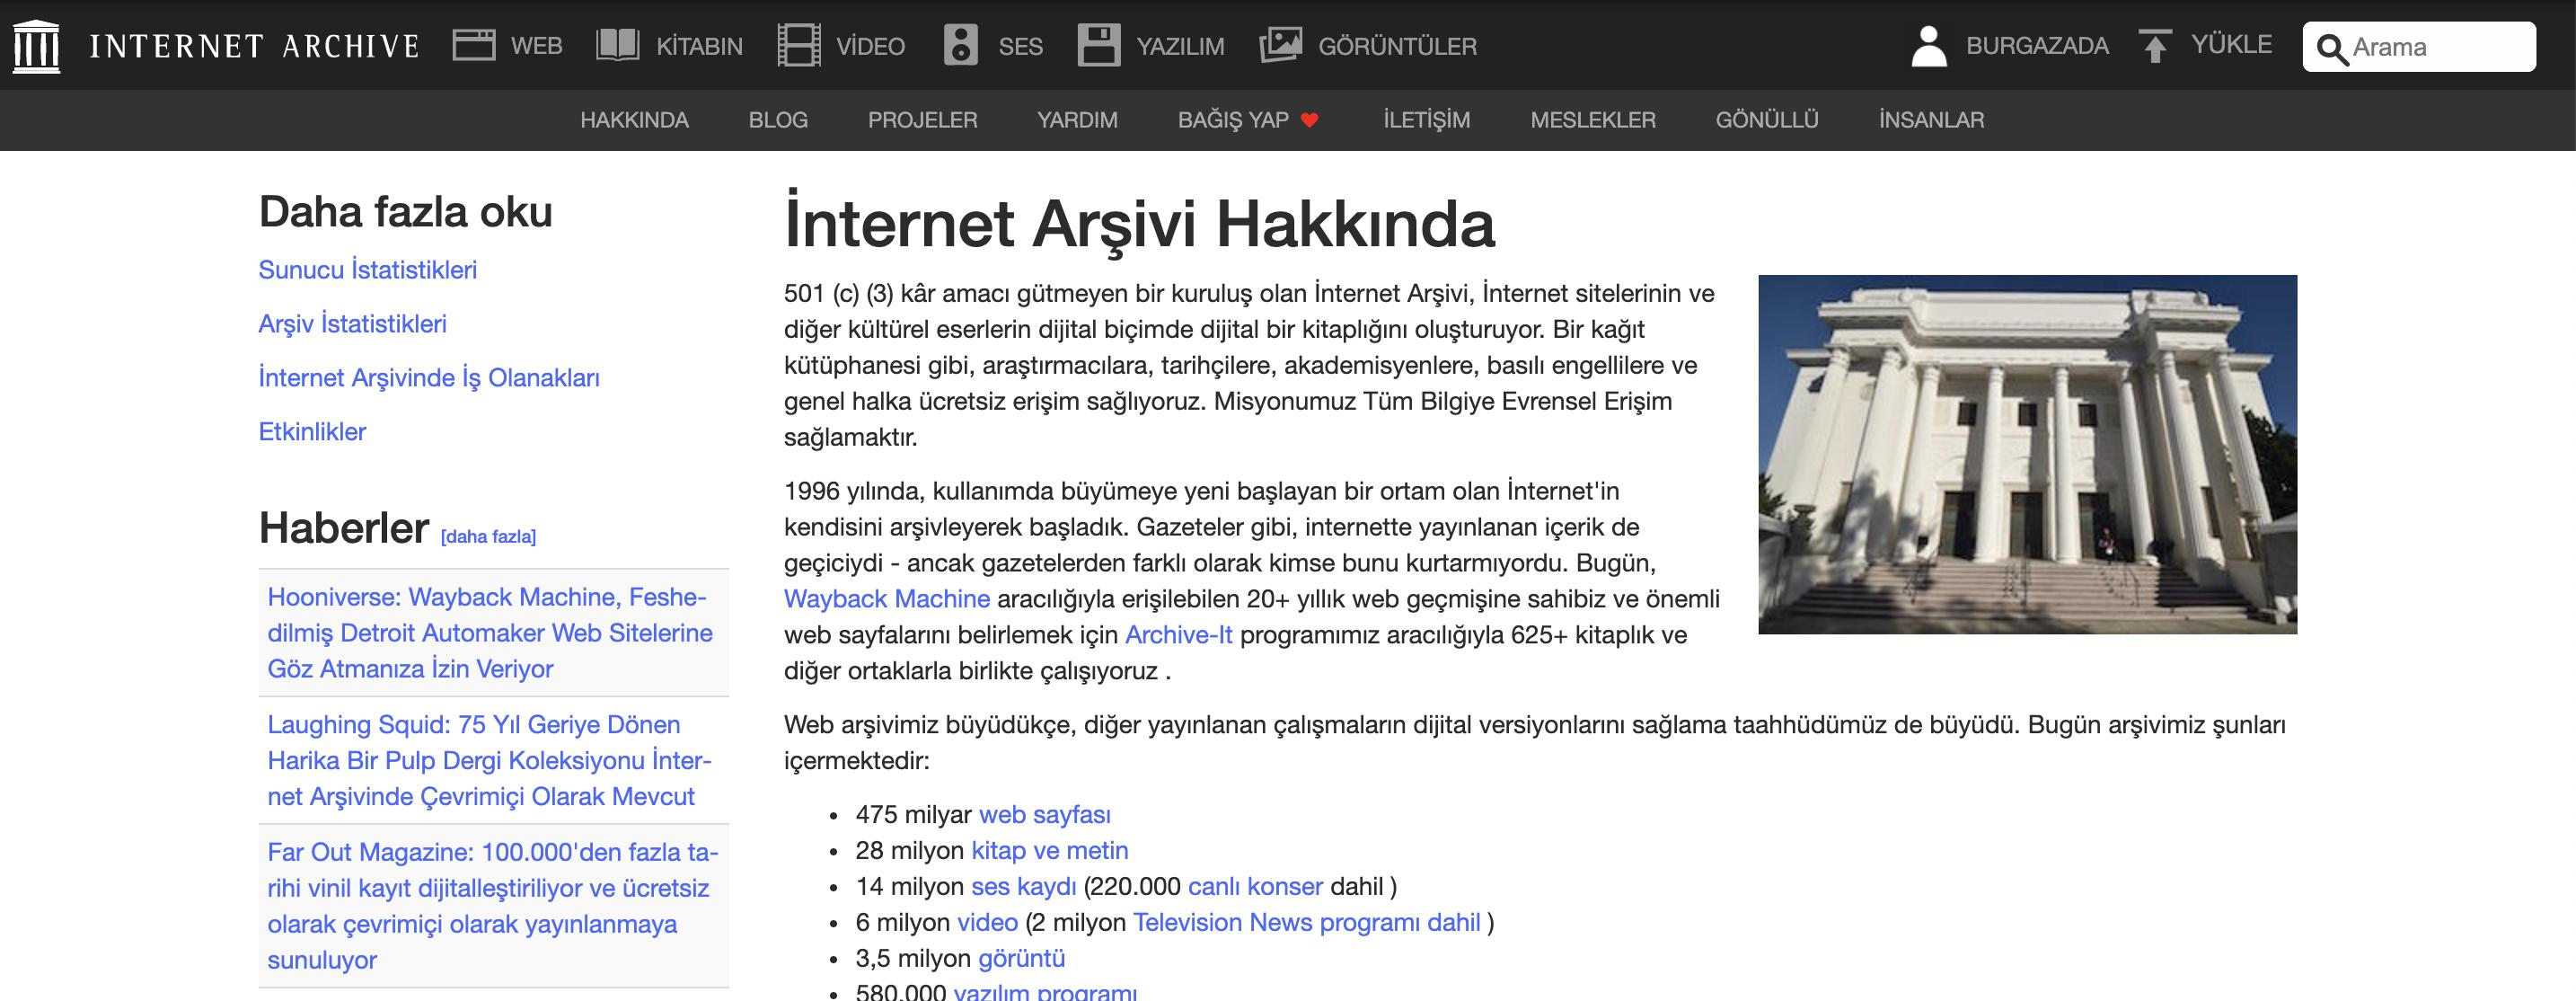 İnternet Arşiv